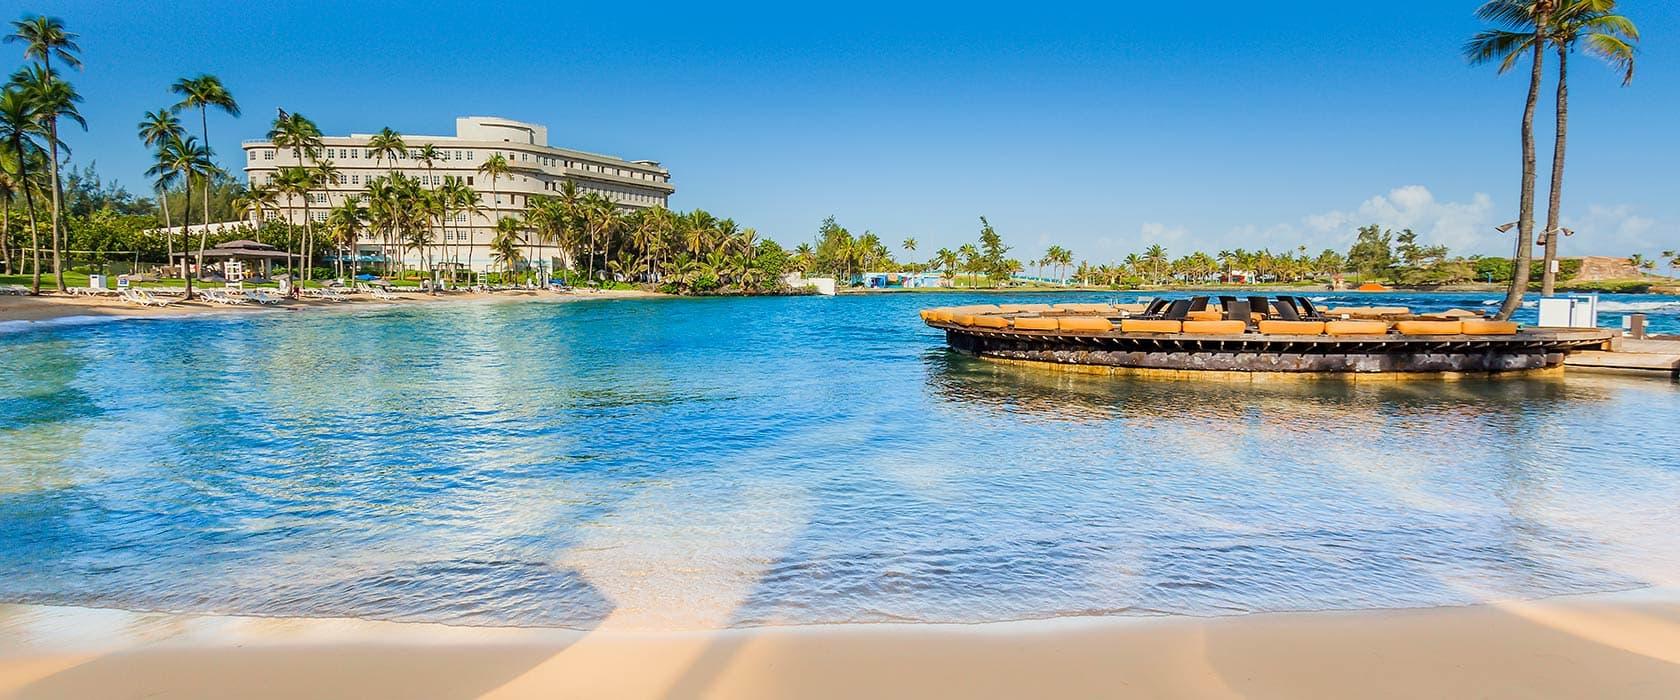 Atlantic Beach Hotel And Bar Puerto Rico